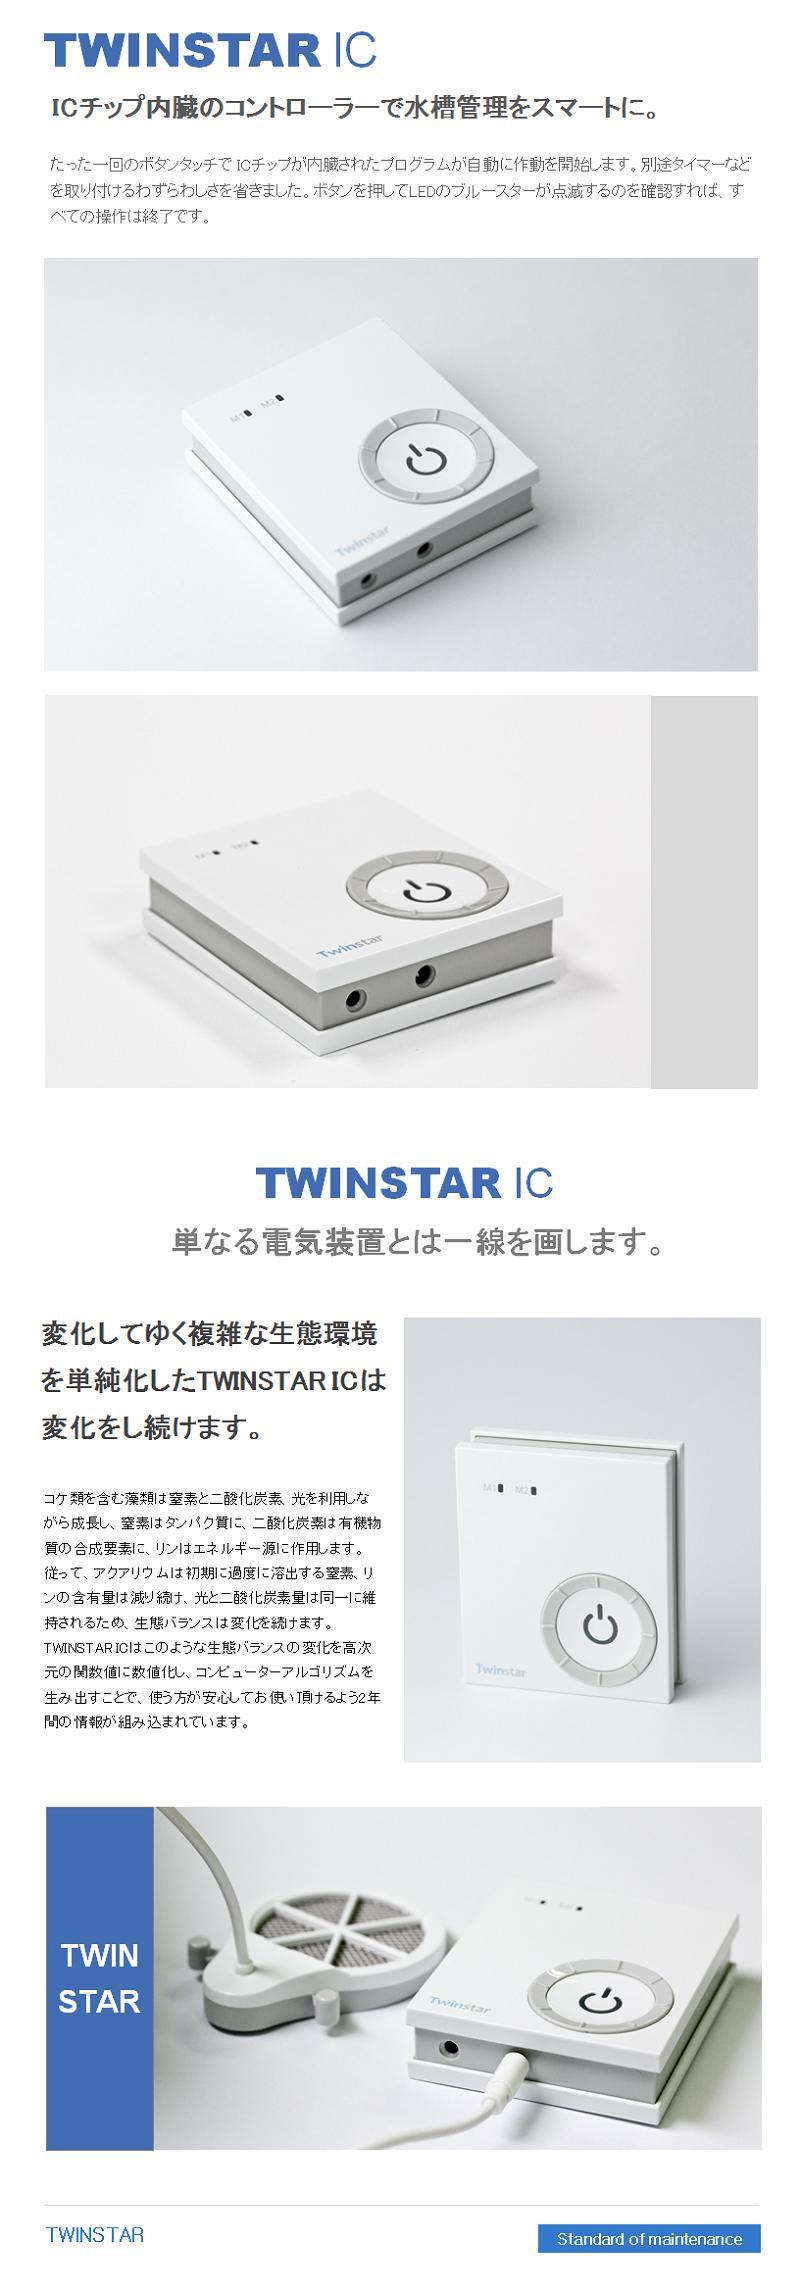 TWINSTAR20IC_JP.jpg